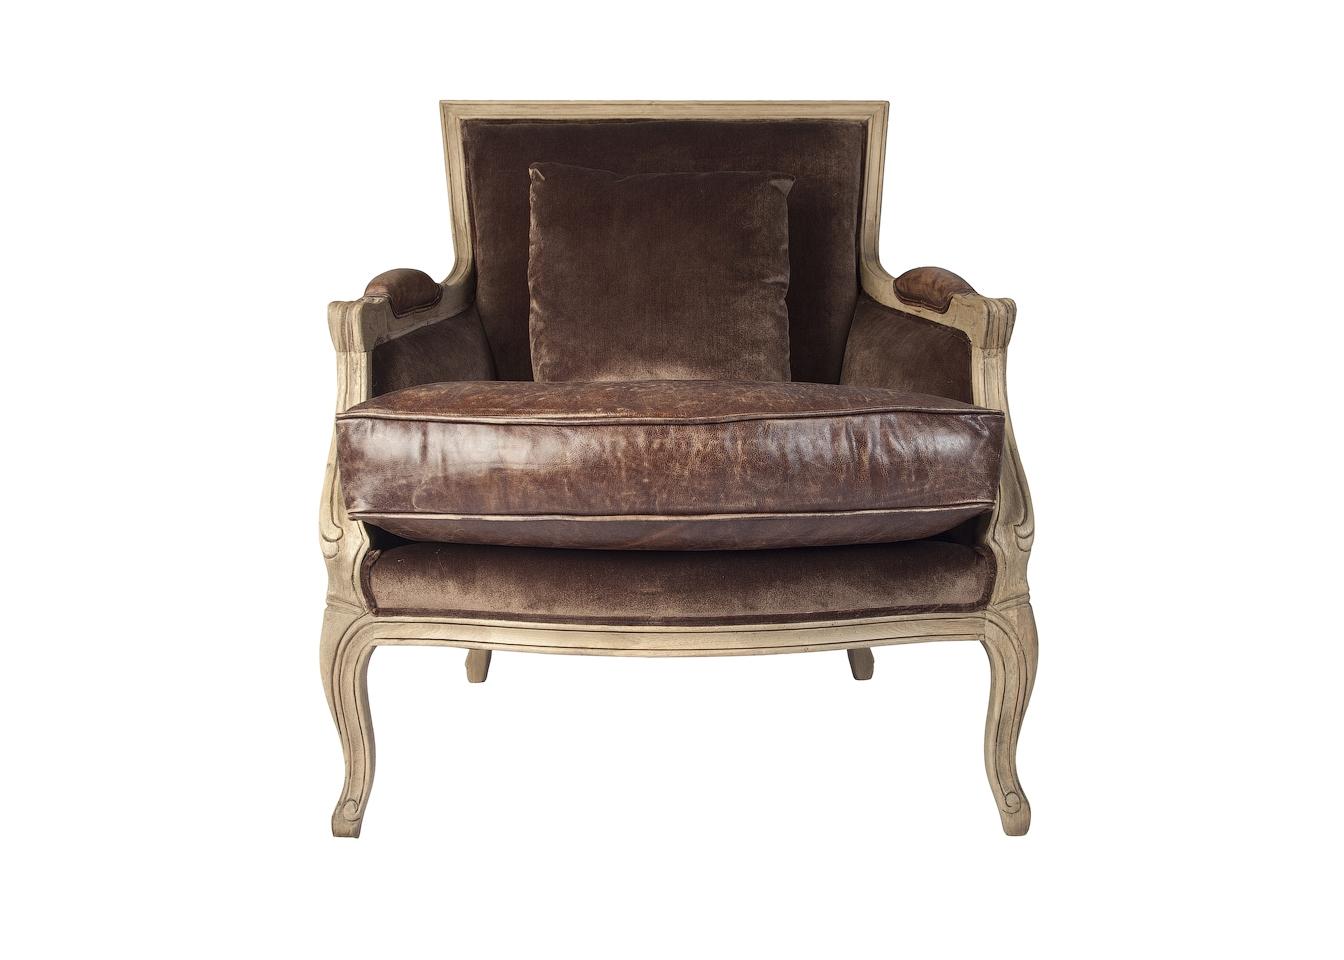 Кресло ХильдаИнтерьерные кресла<br><br><br>Material: Кожа<br>Width см: 89<br>Depth см: 82<br>Height см: 90